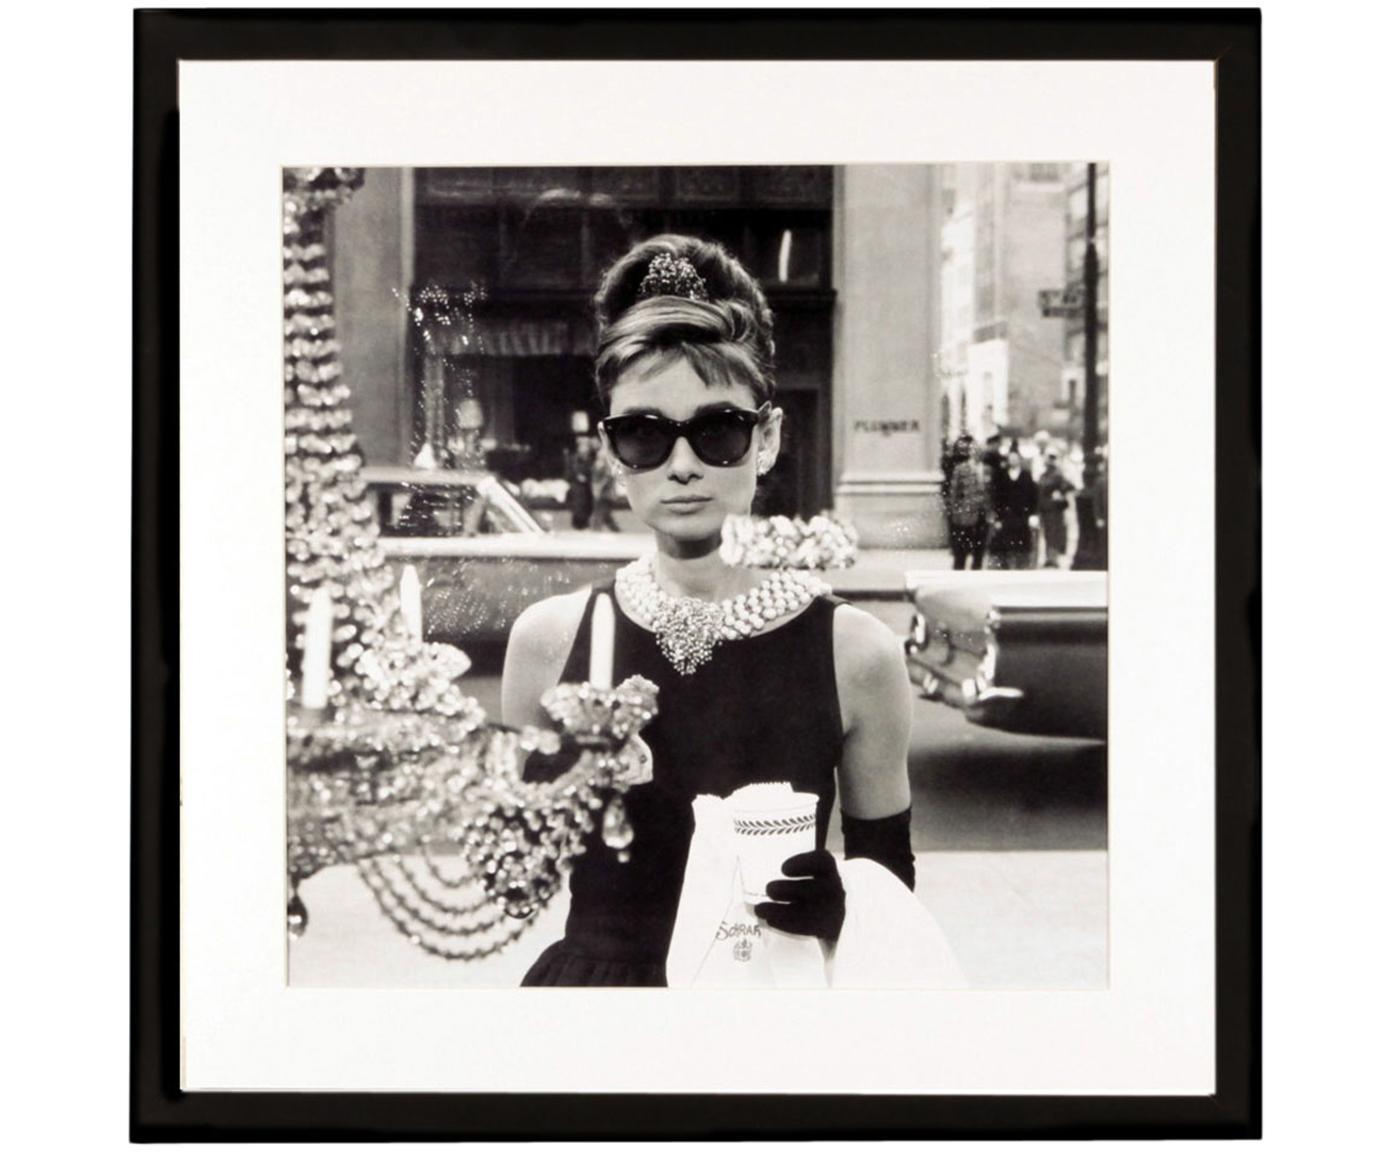 Stampa digitale incorniciata Hepburn, Immagine: Matho Litho carta, Cornice: telaio in materiale sinte, Nero, bianco, L 40 x A 40 cm